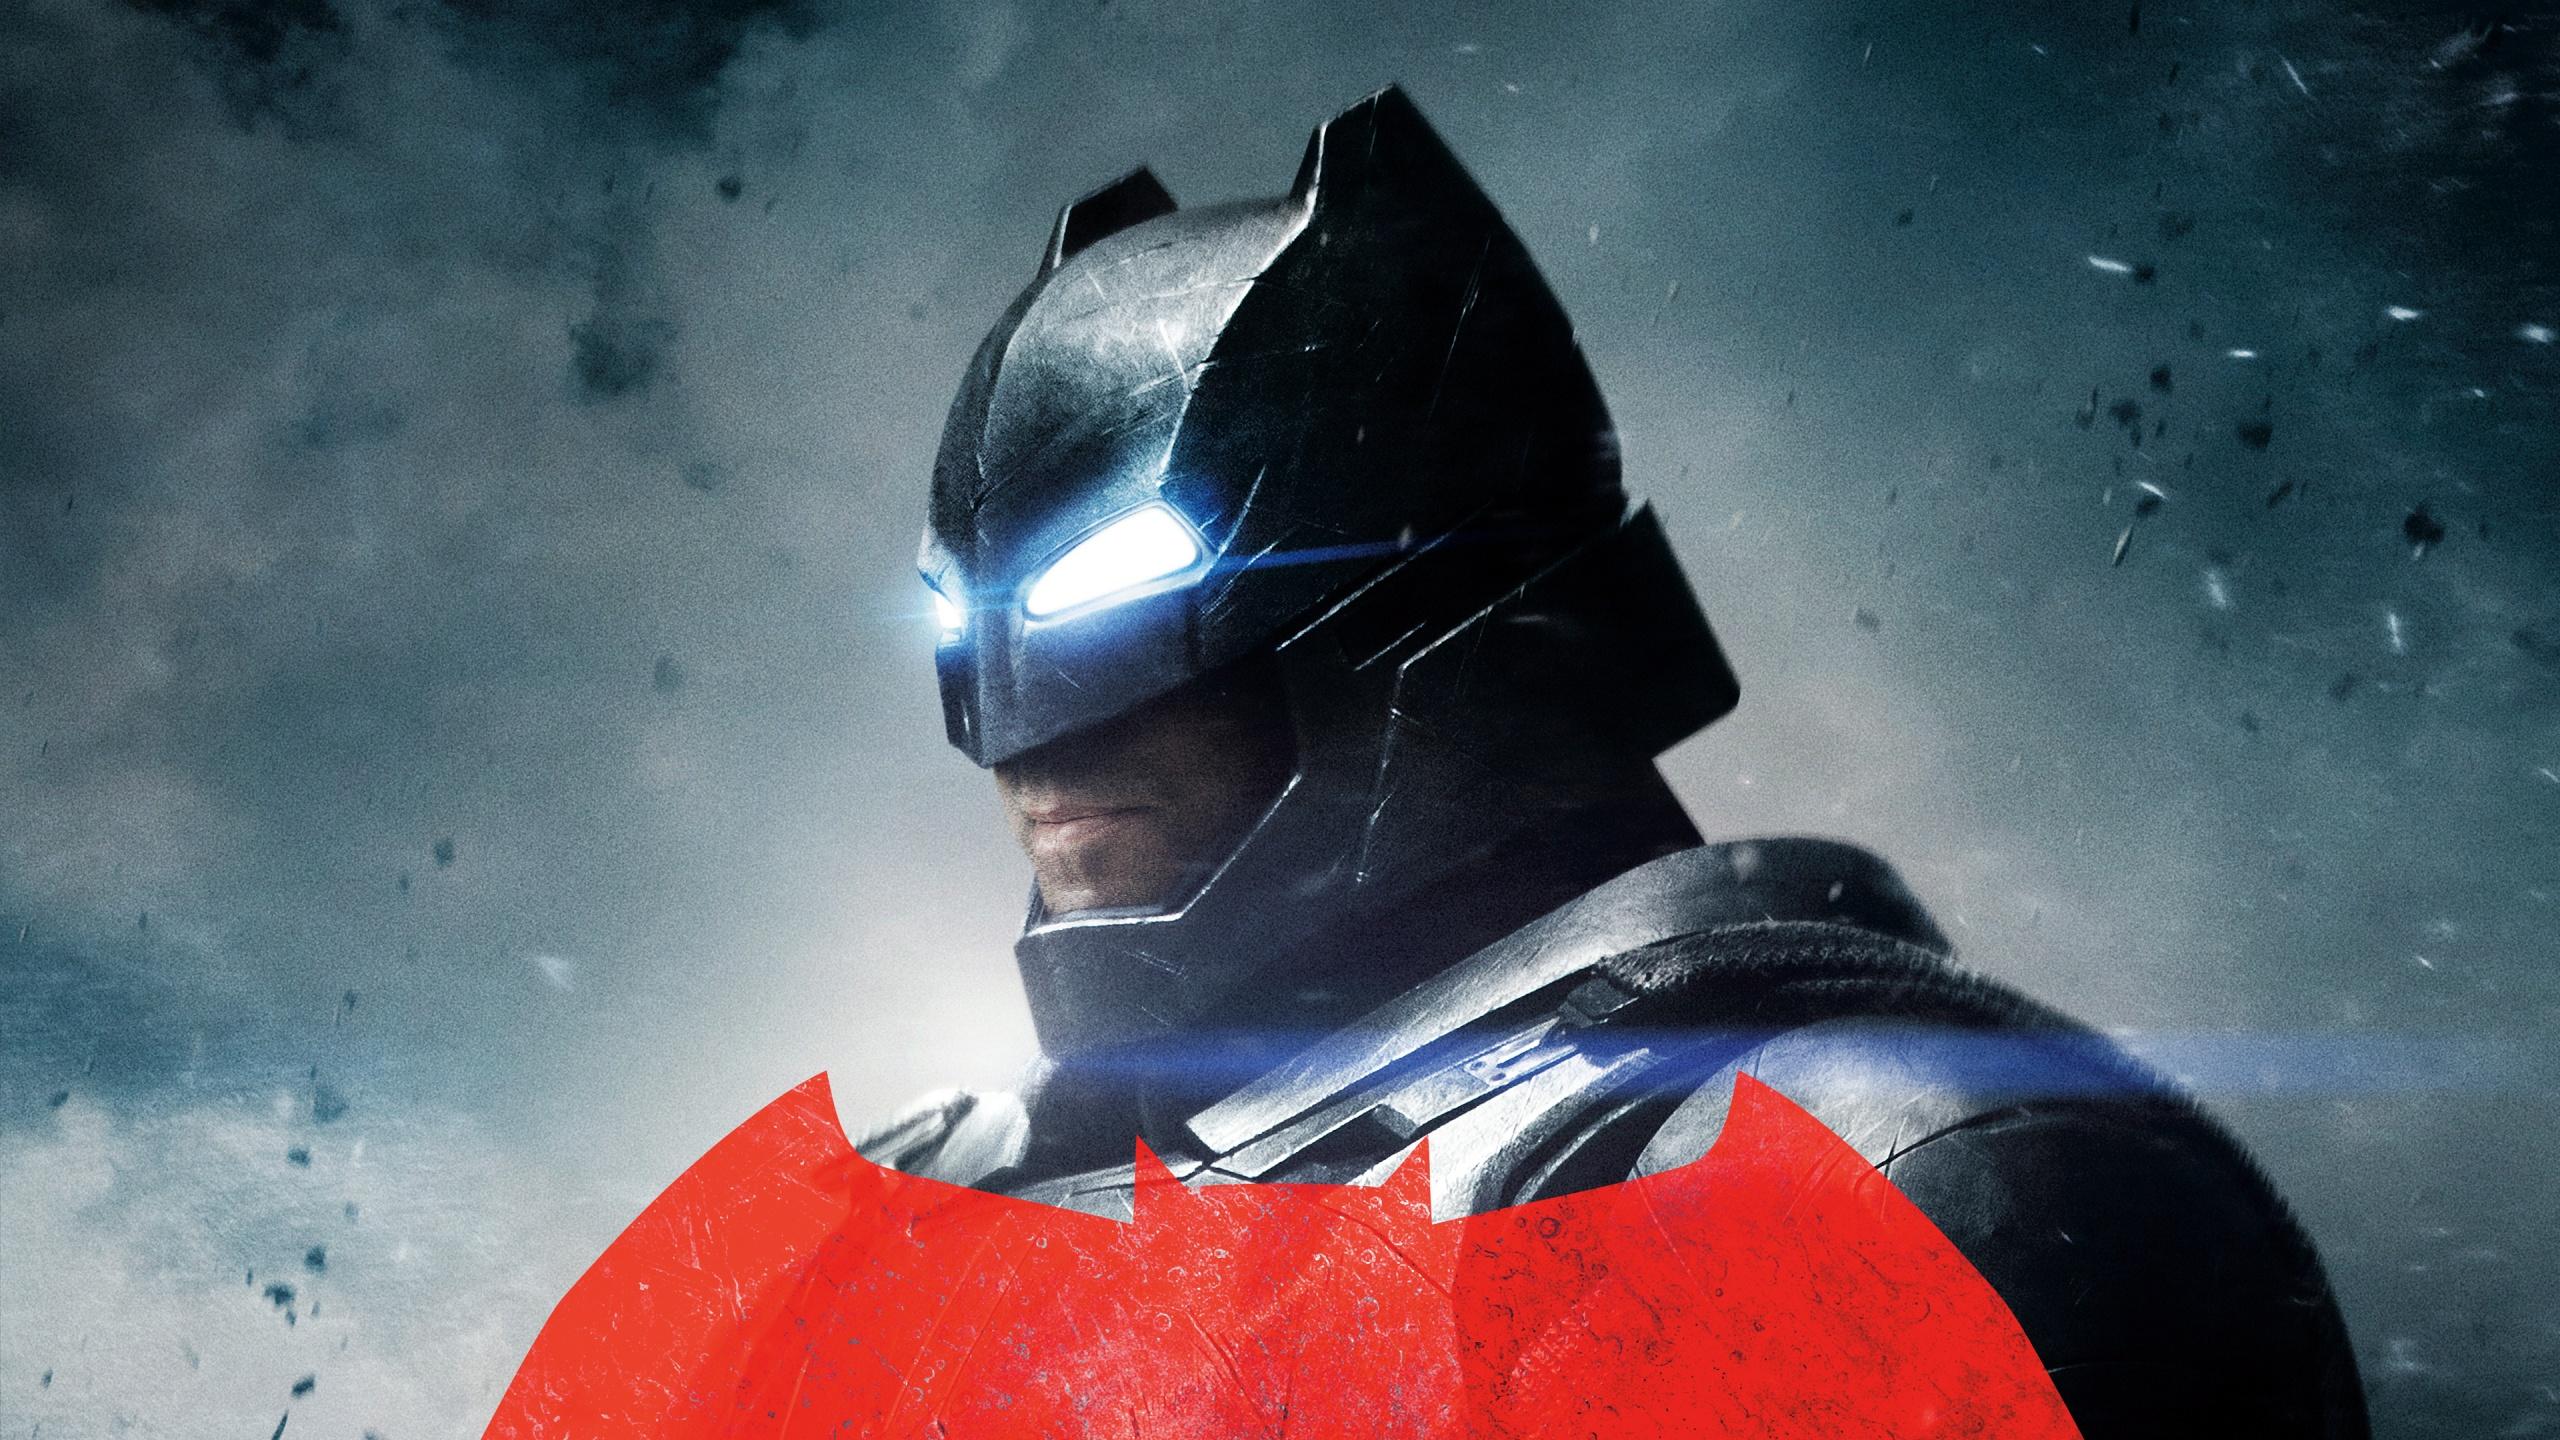 batman v superman batman wallpapers in jpg format for free download